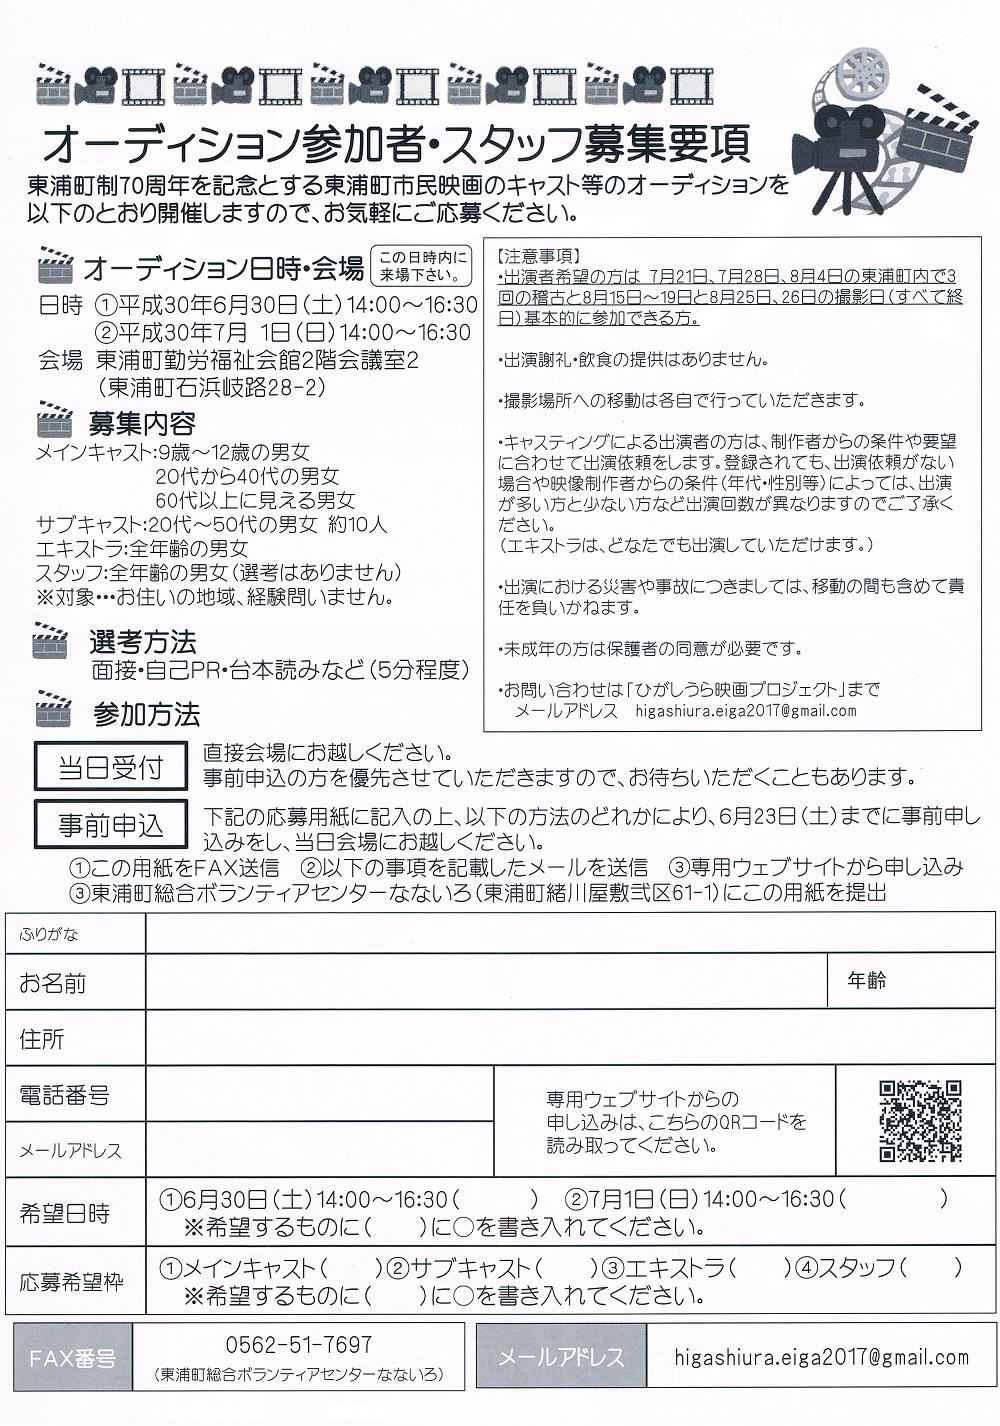 Shimineiga_audition20180630b